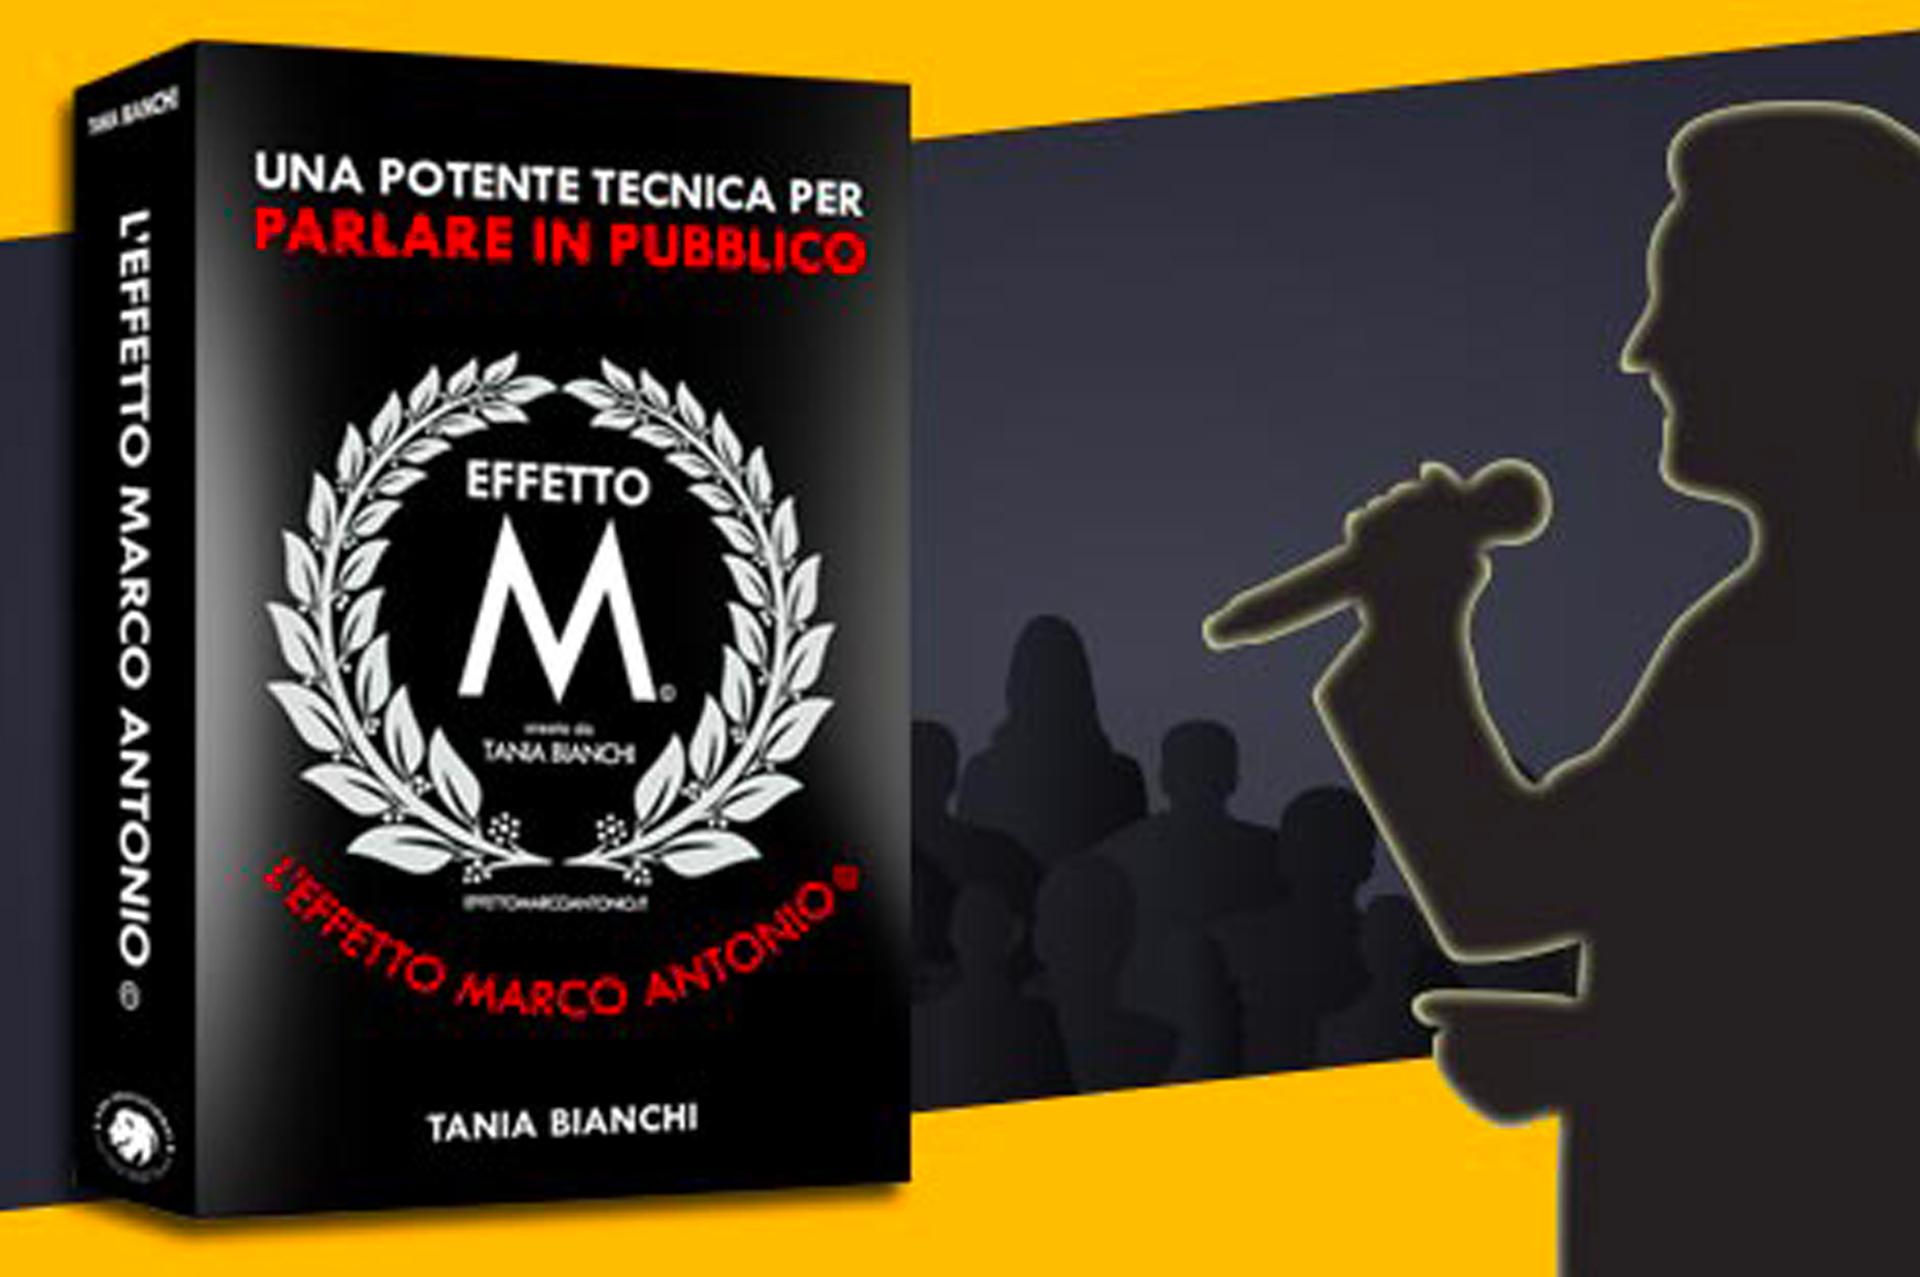 Effetto-Marco_antonio